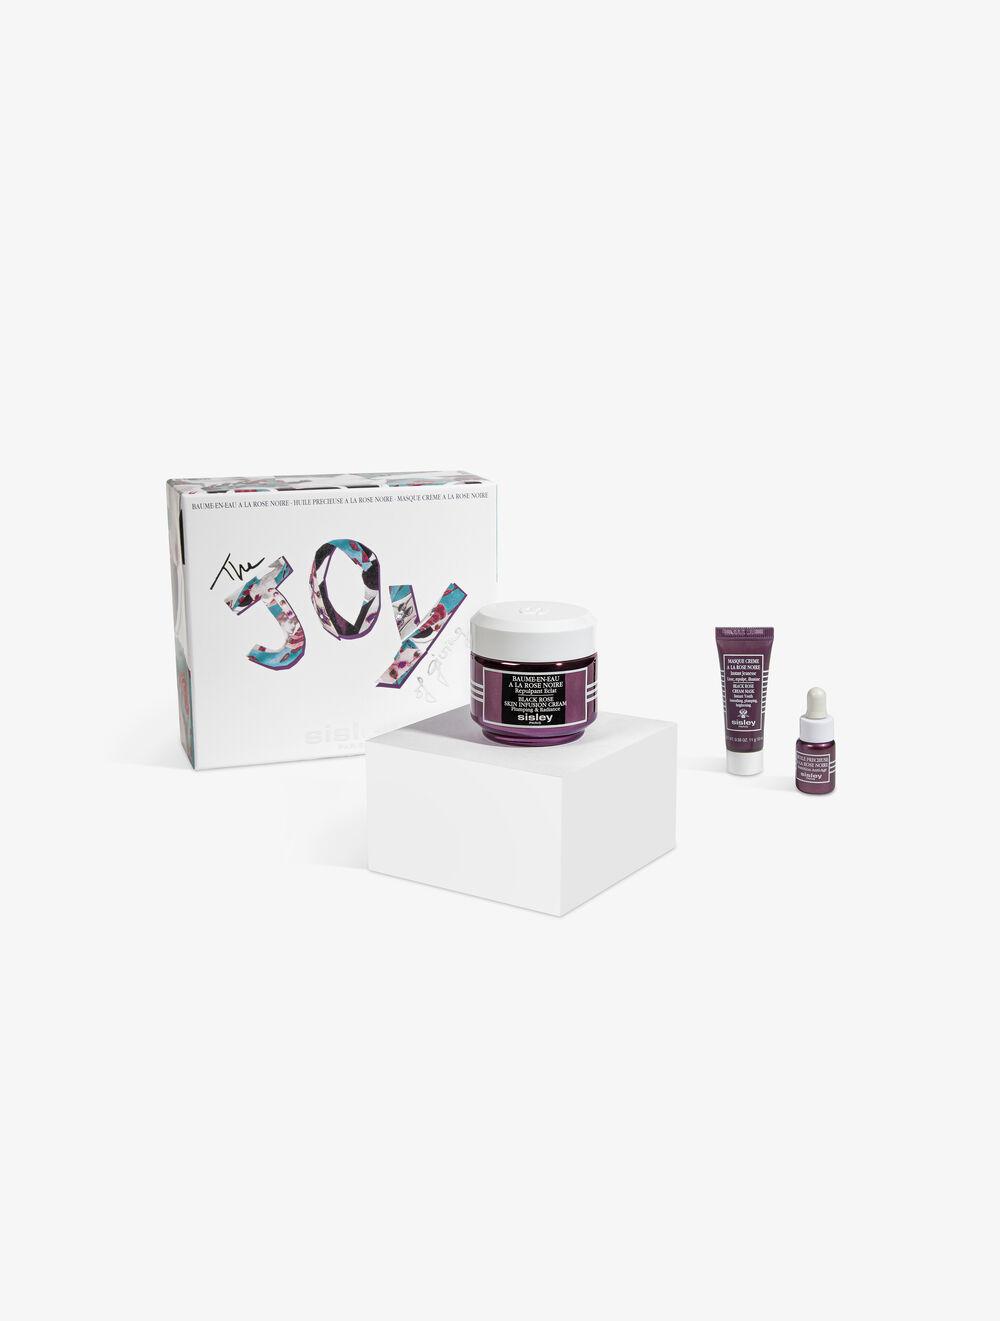 Black Rose Skin Infusion Cream Discovery Program